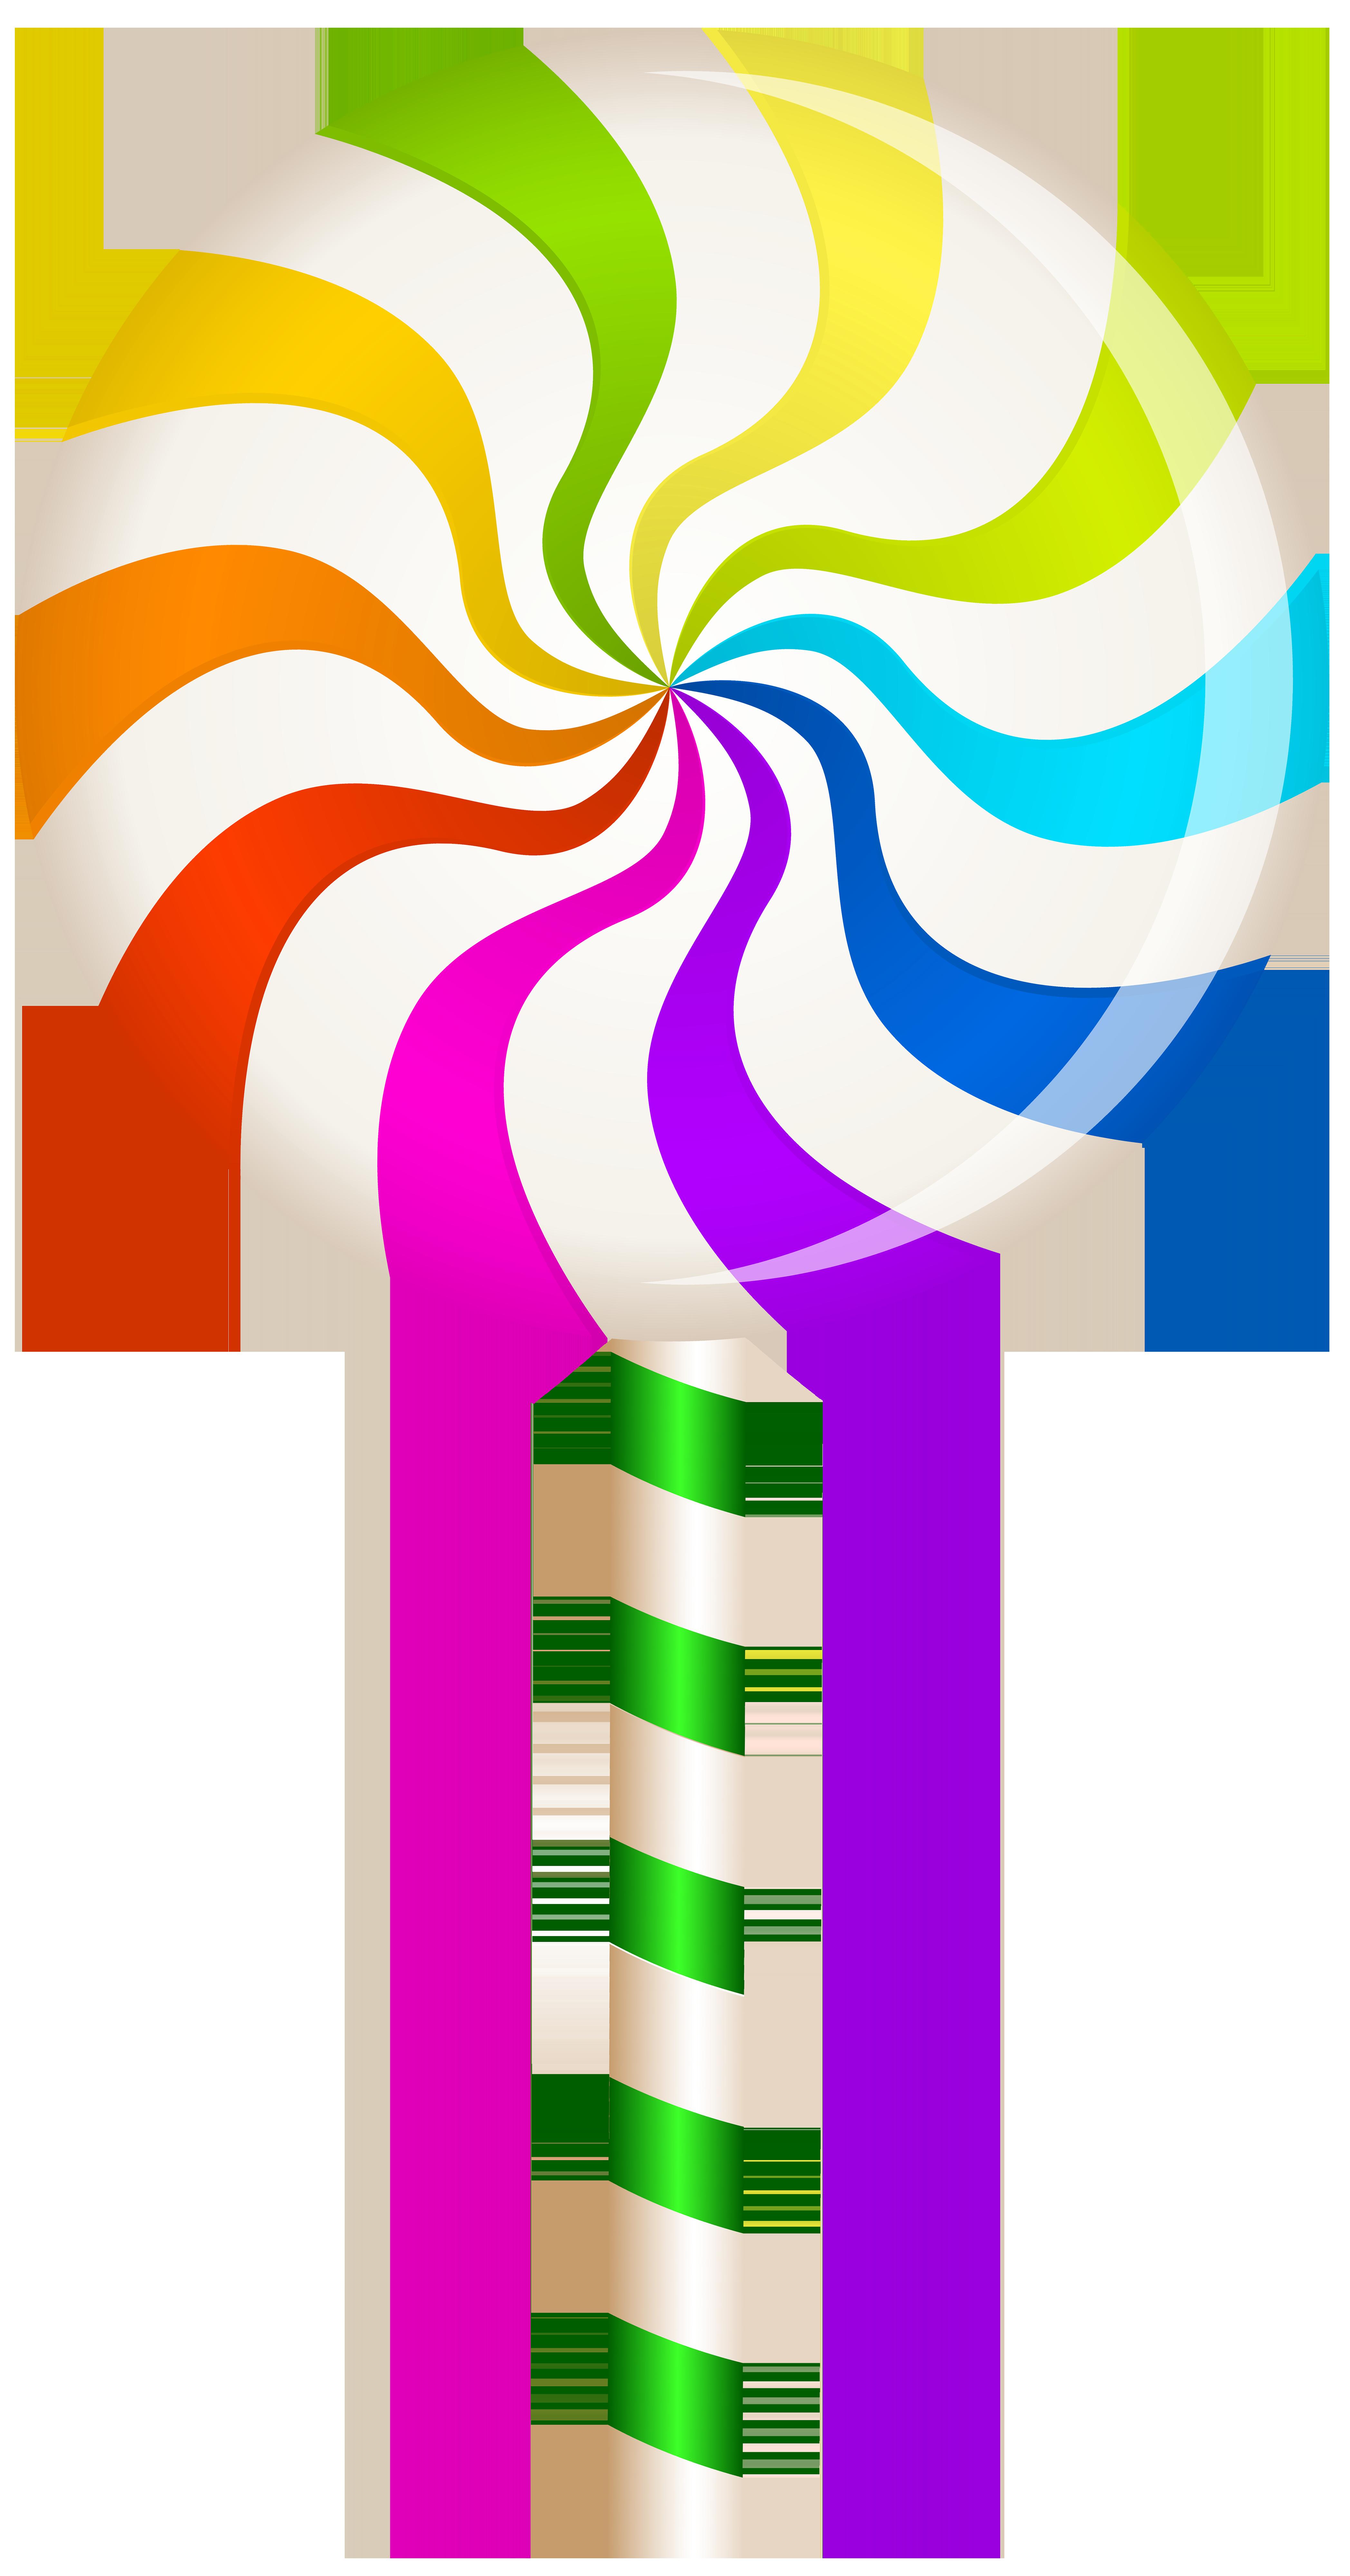 Multicolor Swirl Lollipop PNG Clip Art Image.